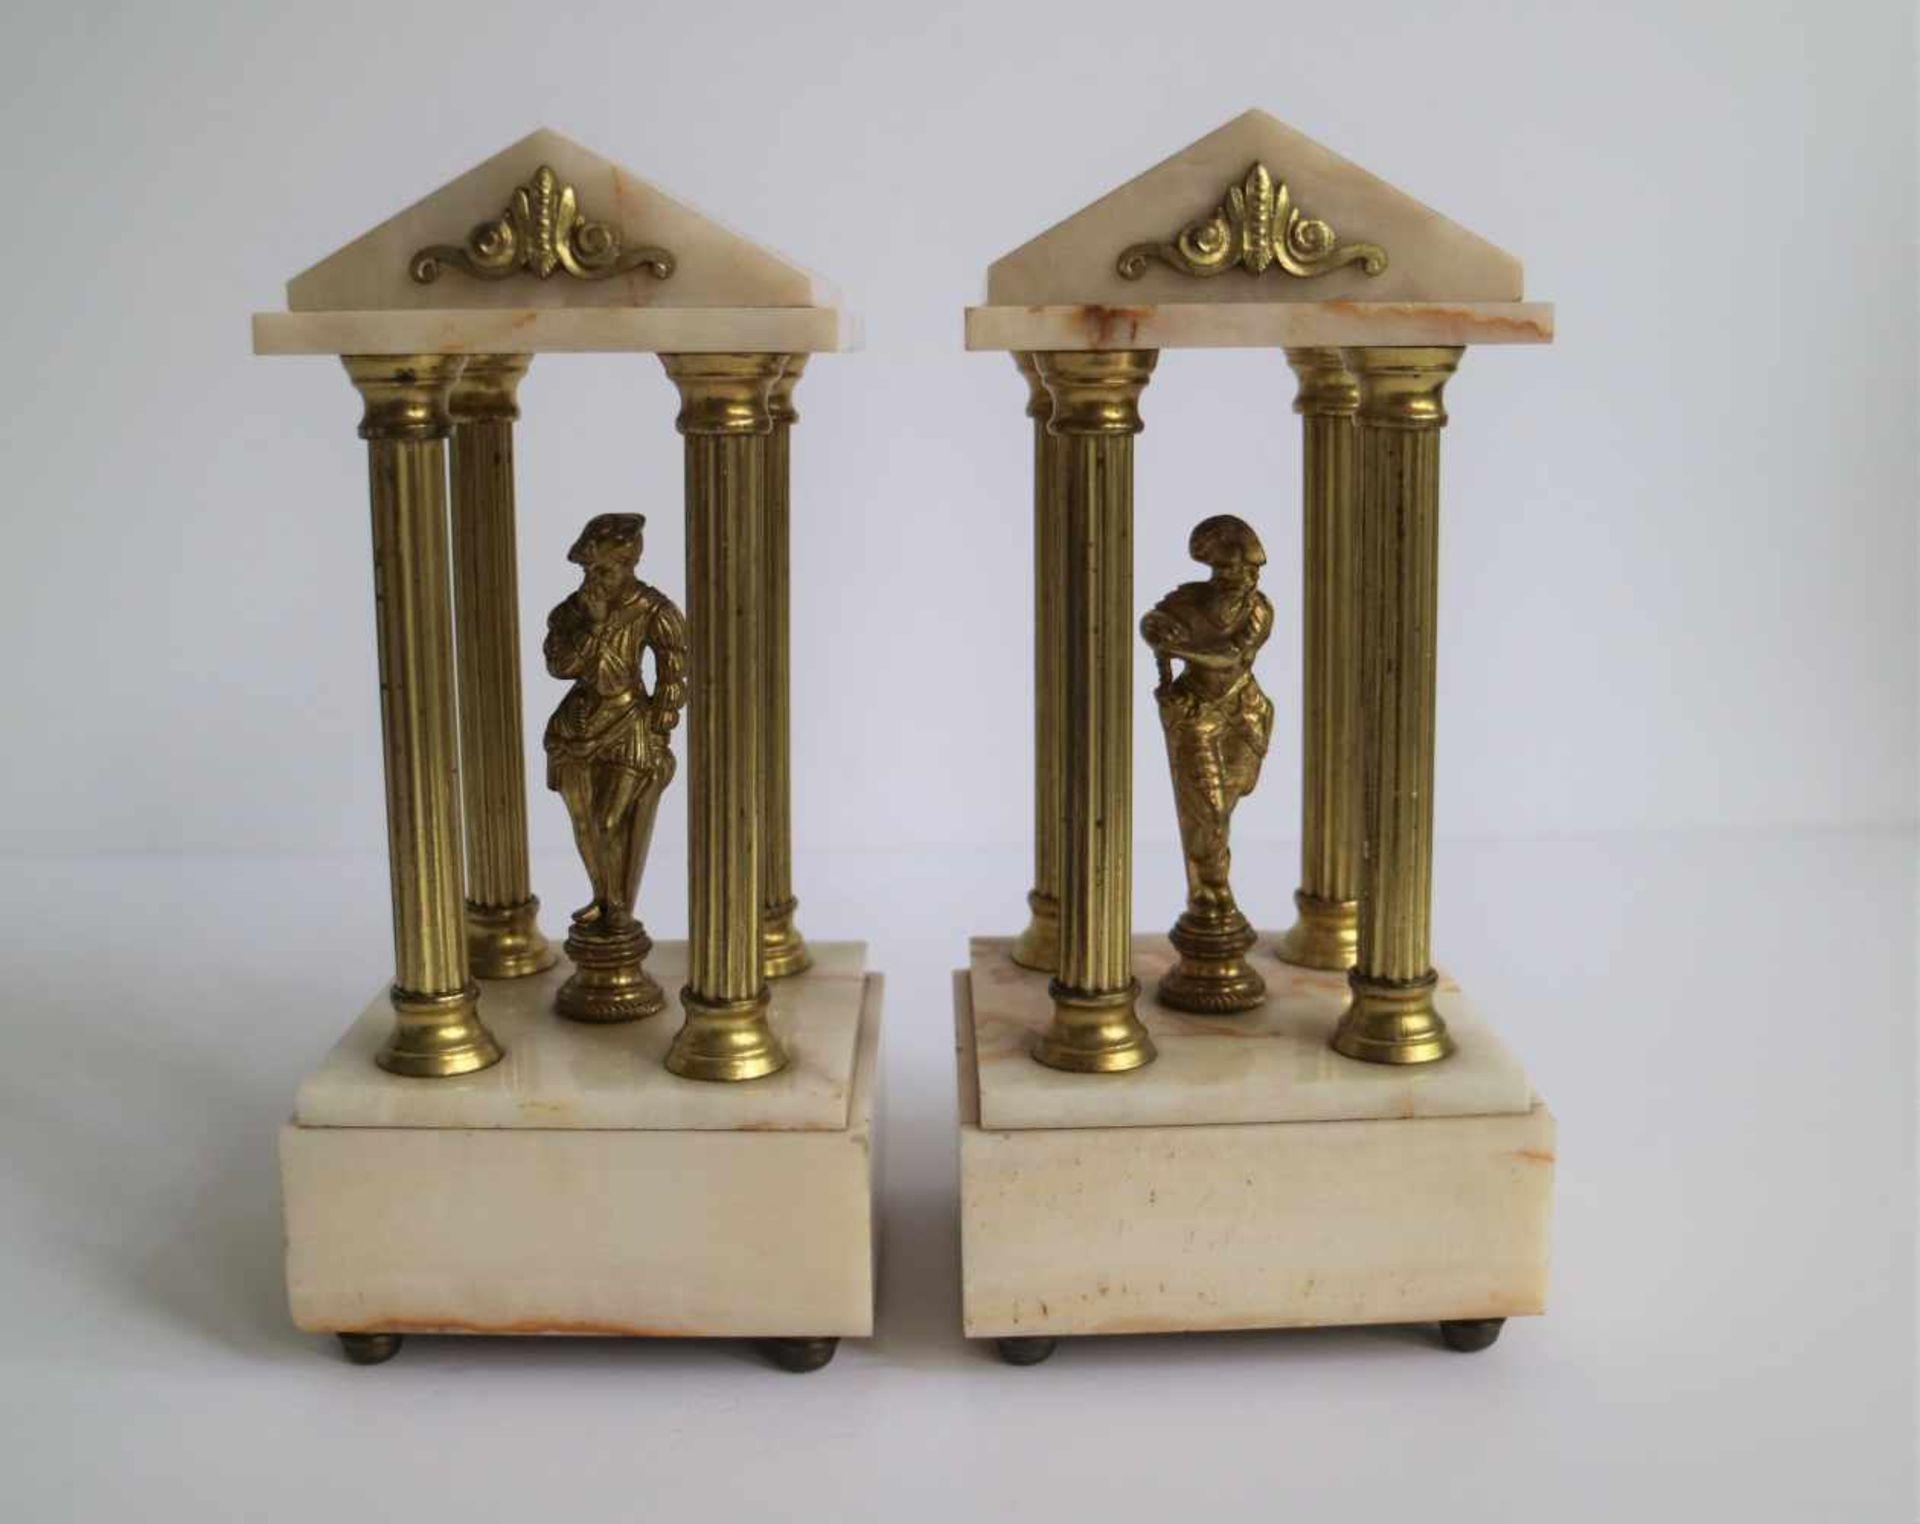 Los 539 - Clock in marble neo classic 3 parts H 22,5 B 11 en H 29,5 B 32,5 cm